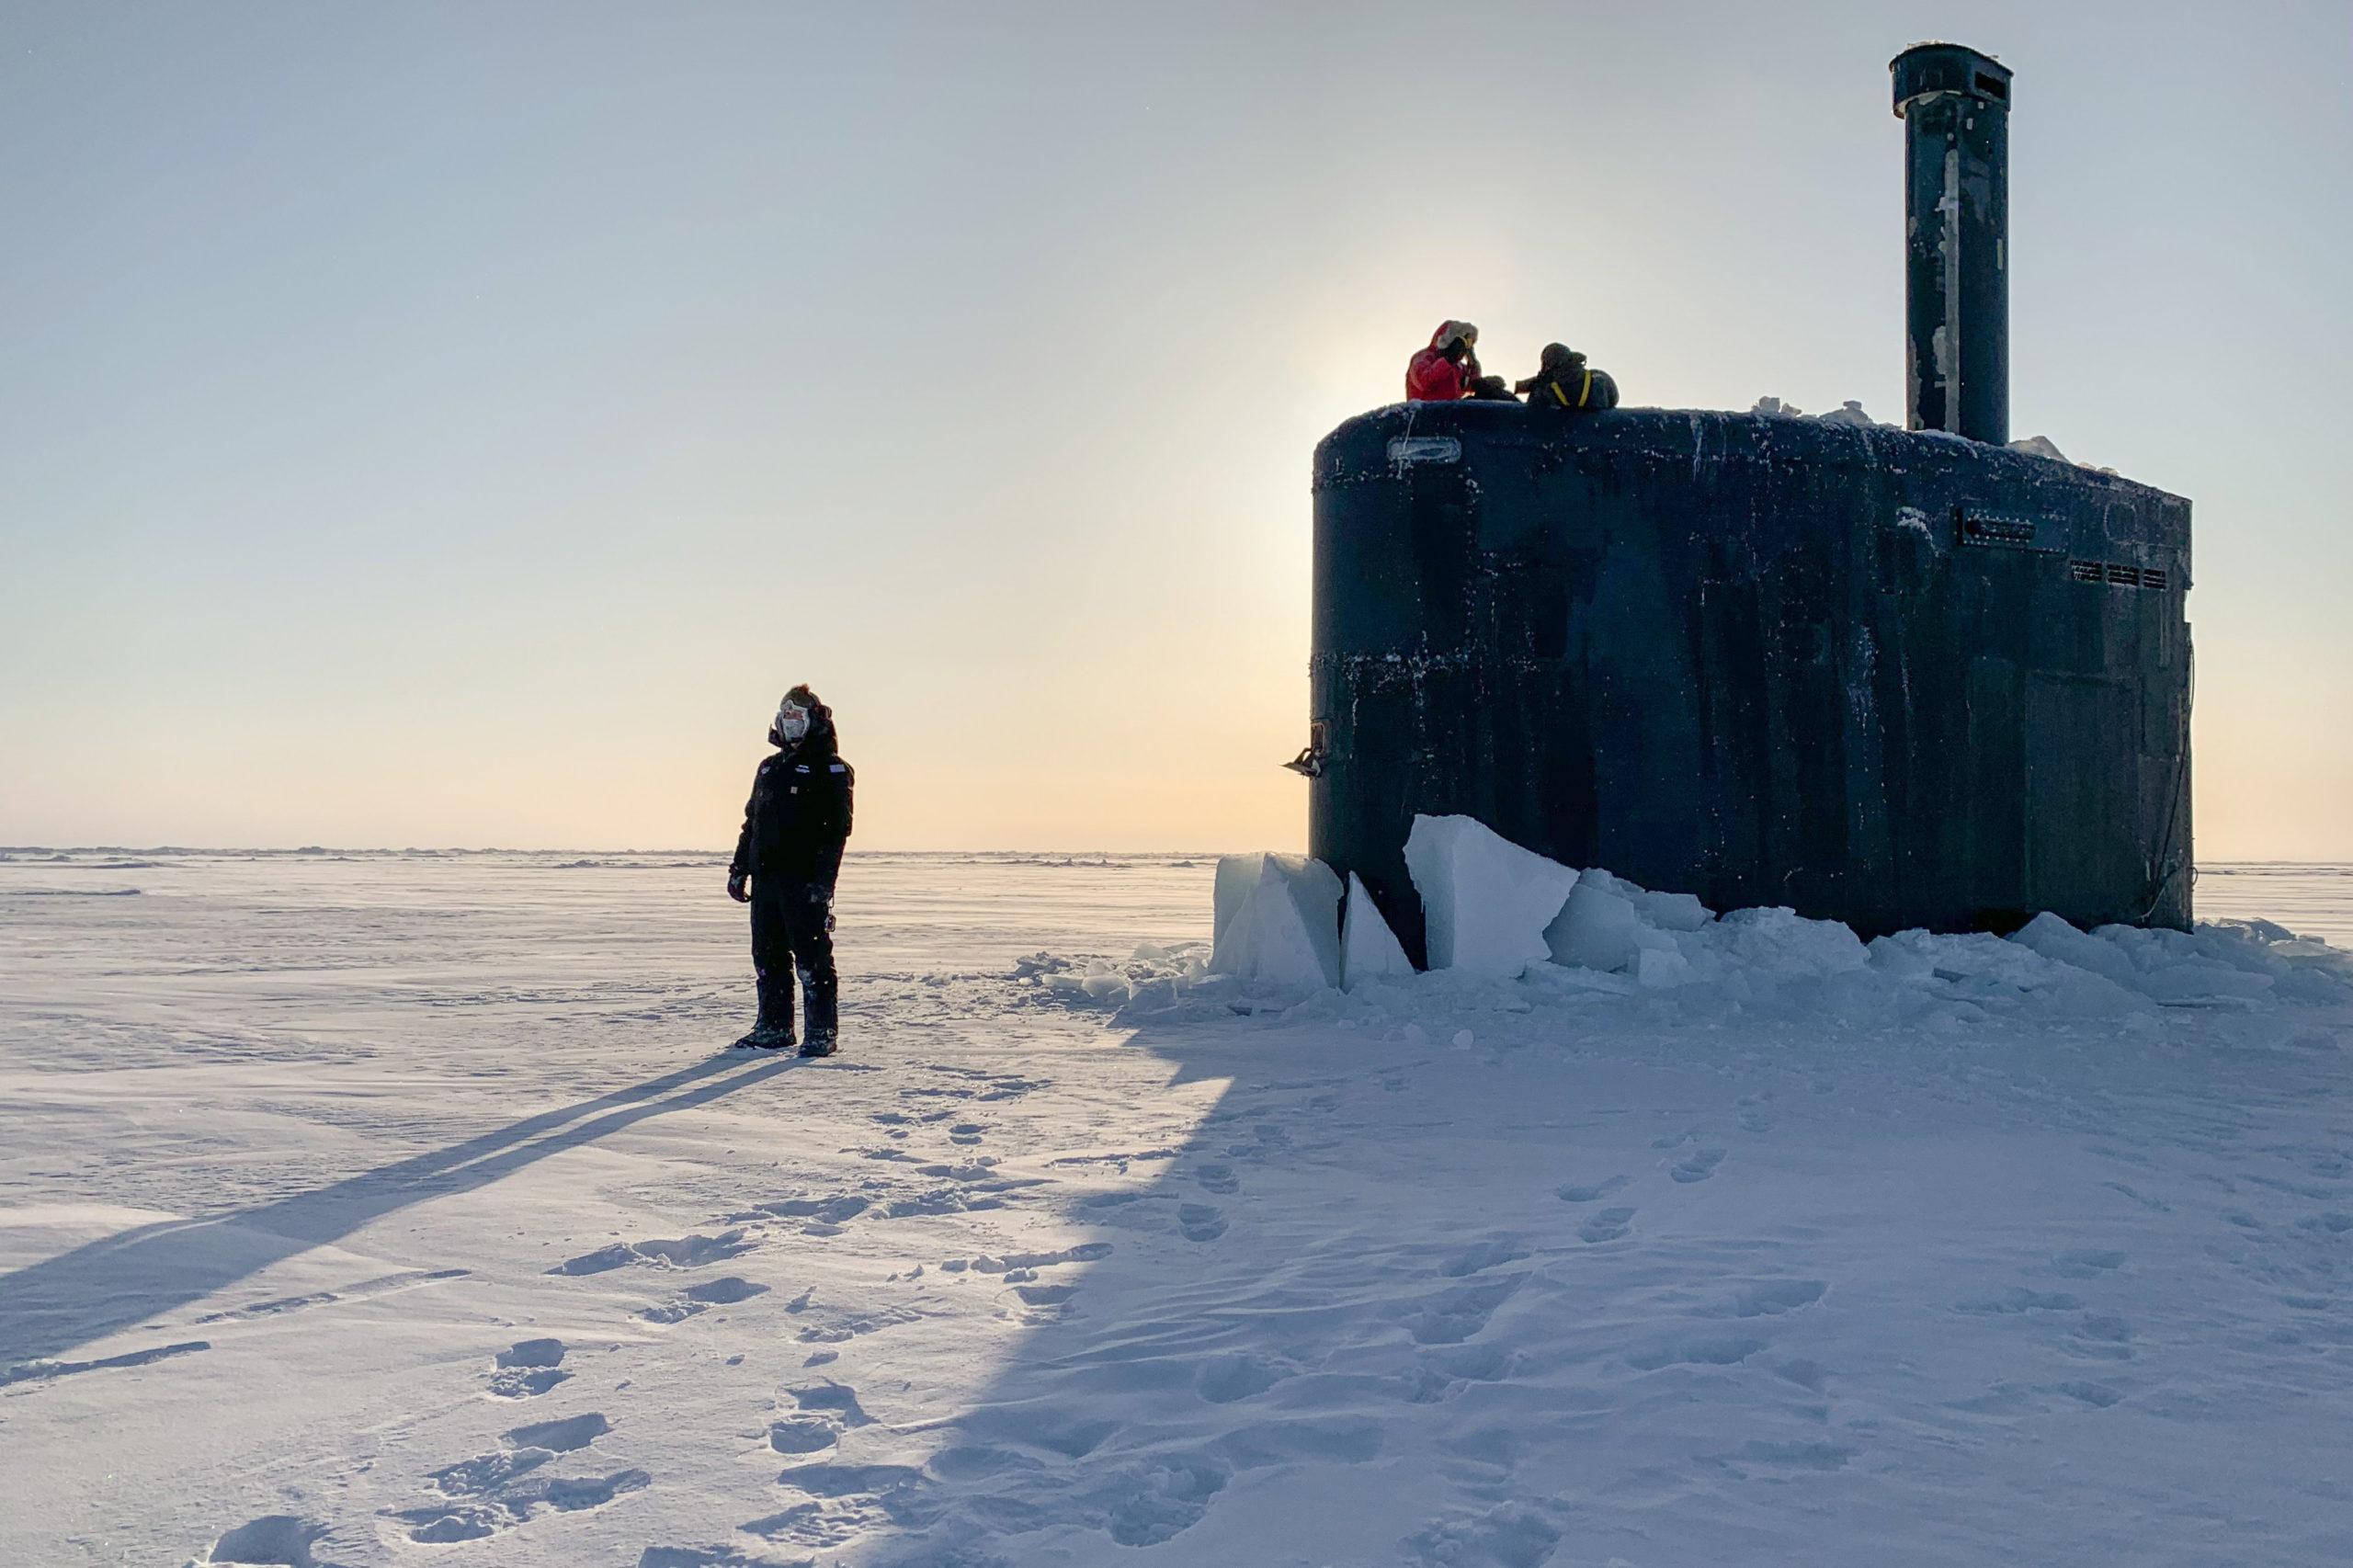 USS Toledo Arrives at Ice Camp Seadragon